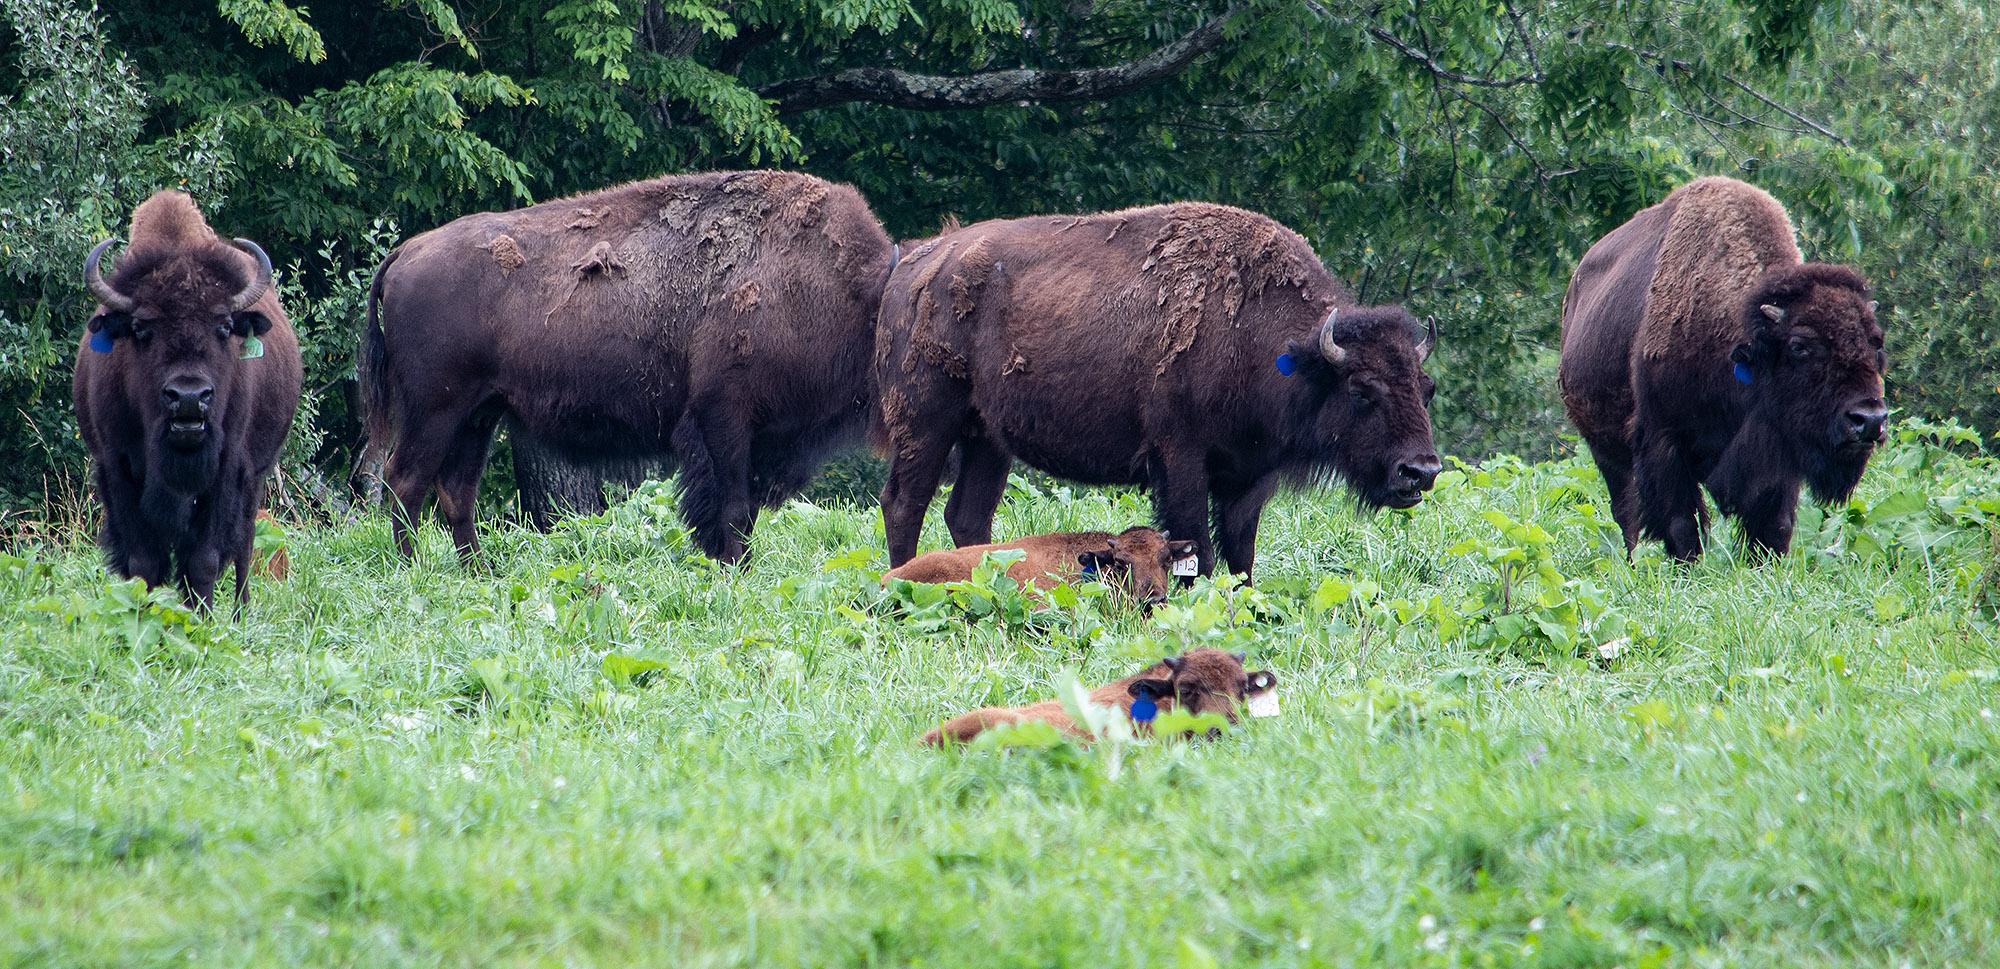 062920pod_buffalo